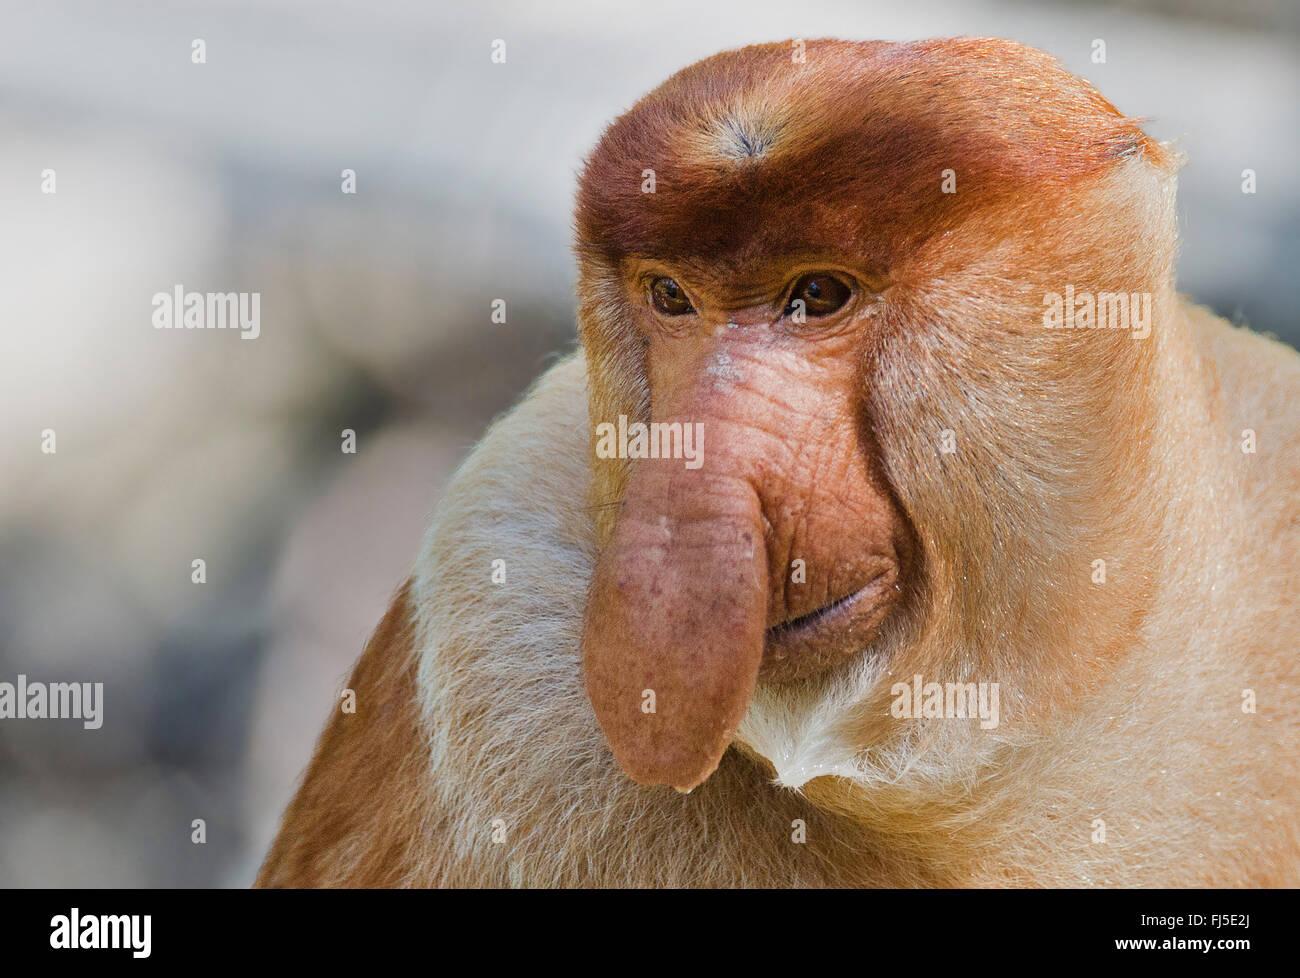 Proboscis Monkey (Nasalis larvatus), mâle adulte, Malaisie, Bornéo, Sabah, Labuk Bay Photo Stock